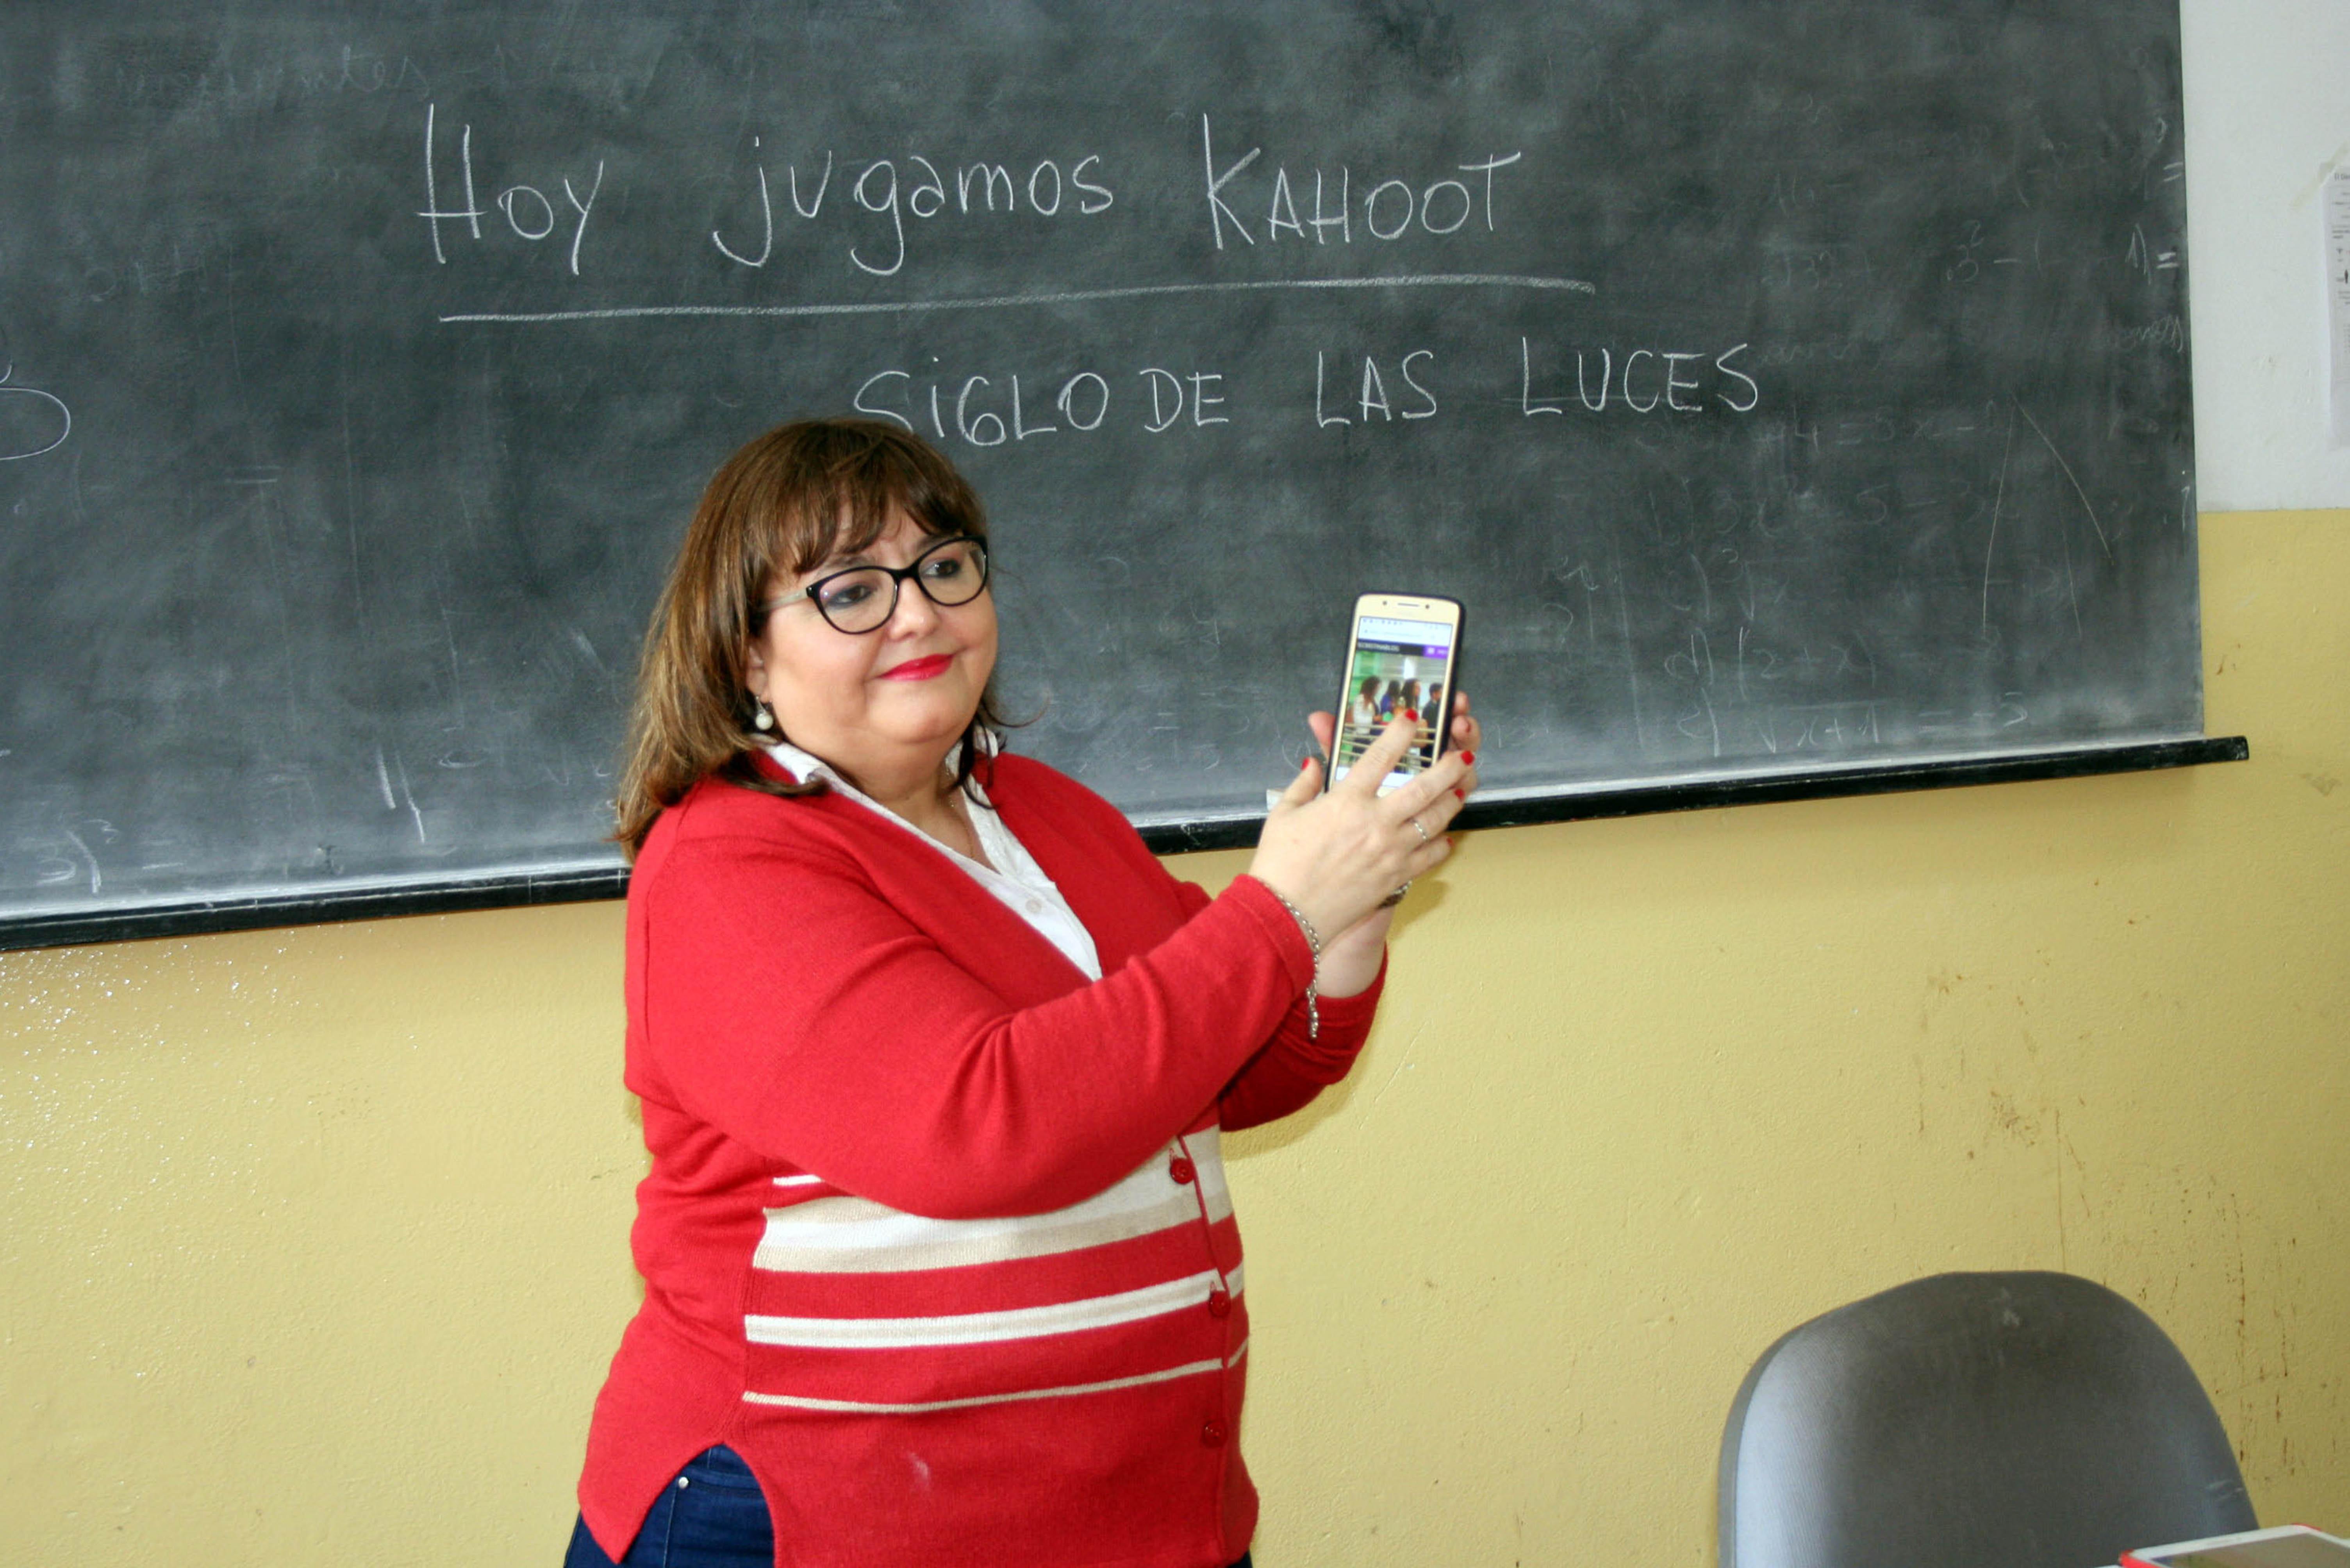 María Cristina Gomez